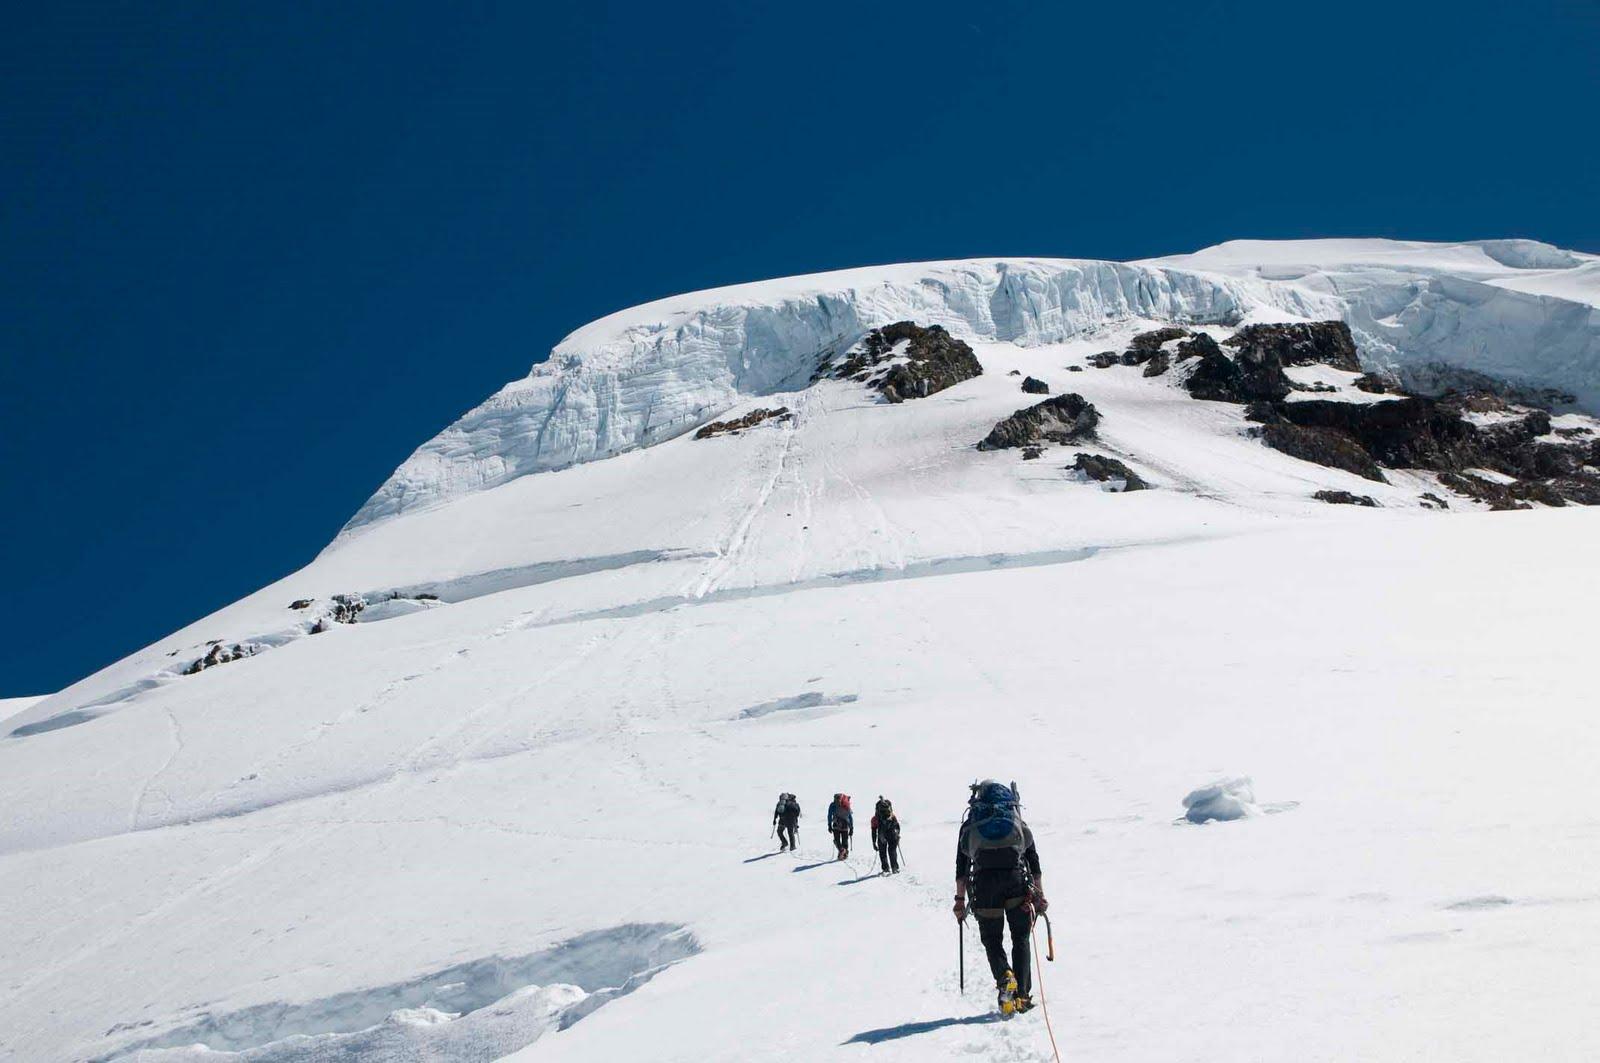 mountain climbing trip essay